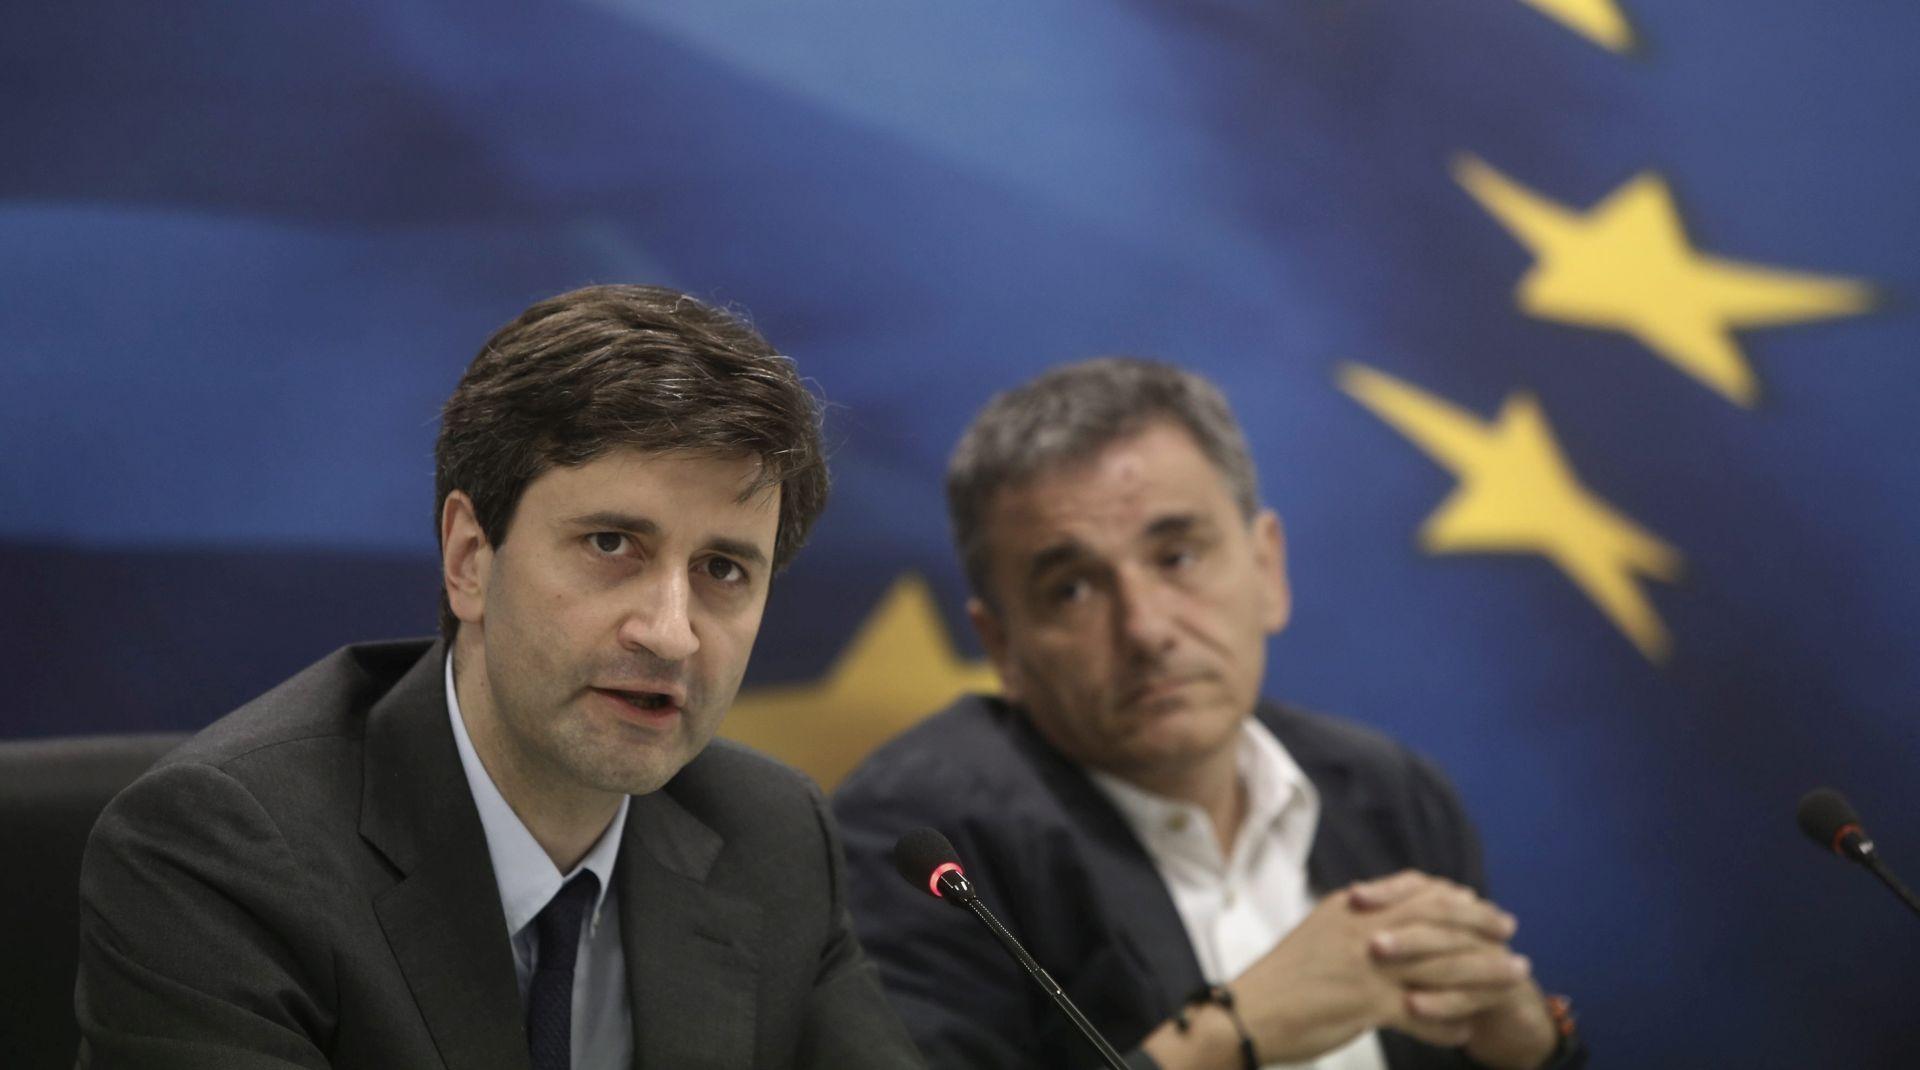 Grčki izbori 20. rujna, po anketama Siriza u blagom vodstvu